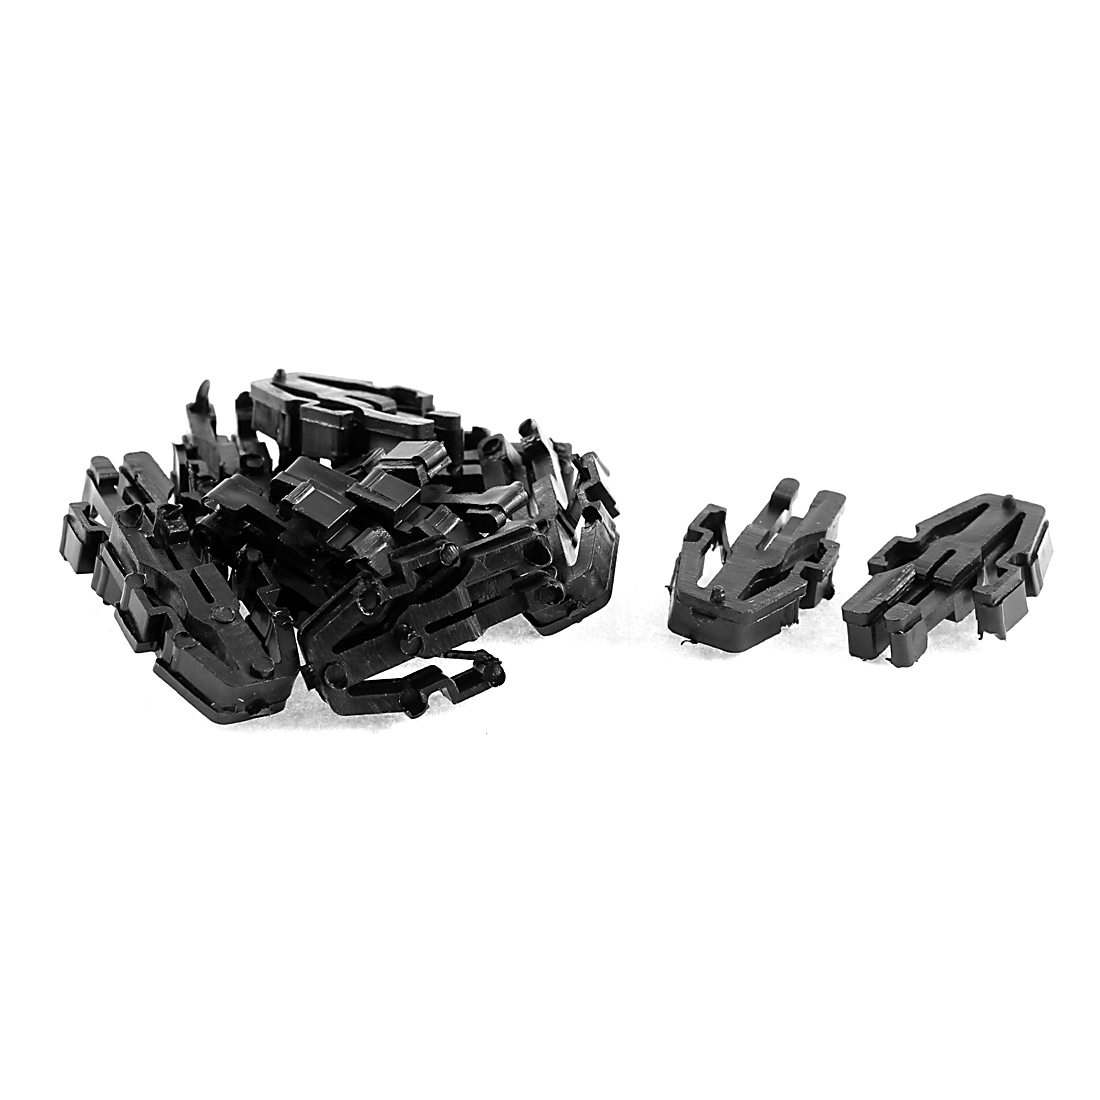 12 Pcs Black Plastic Auto Trim Net Retainer Clips 23mm Length for Toyota